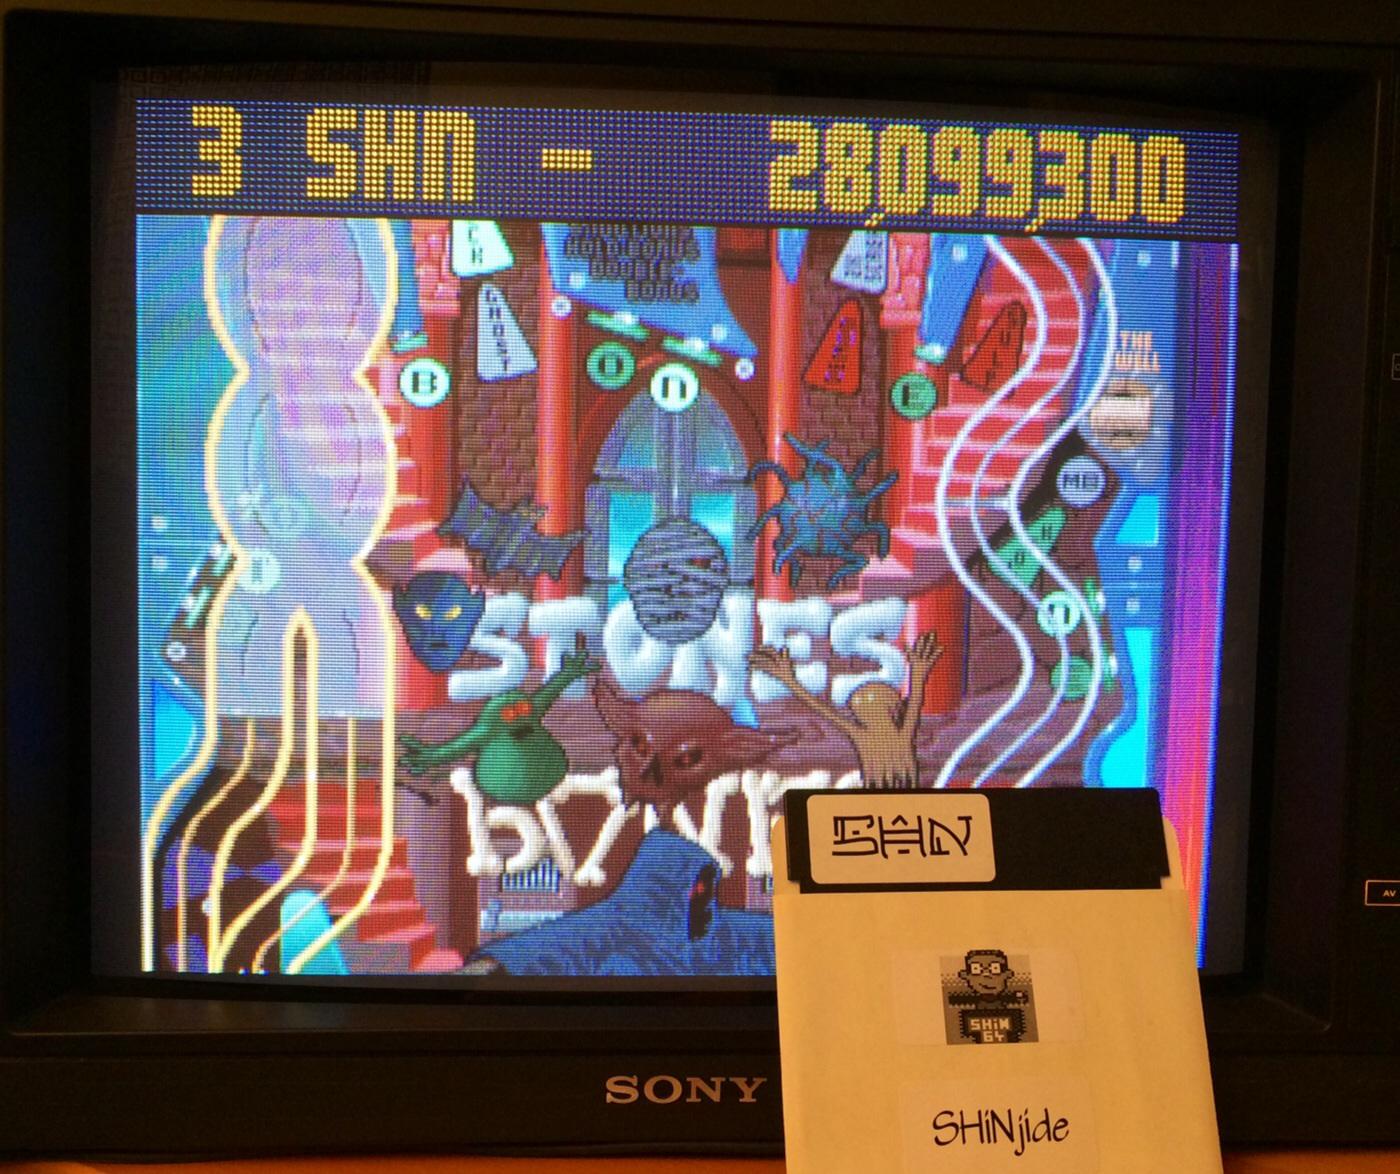 SHiNjide: Pinball Fantasies: Stones N Bones (Amiga) 28,099,300 points on 2014-08-23 13:33:30